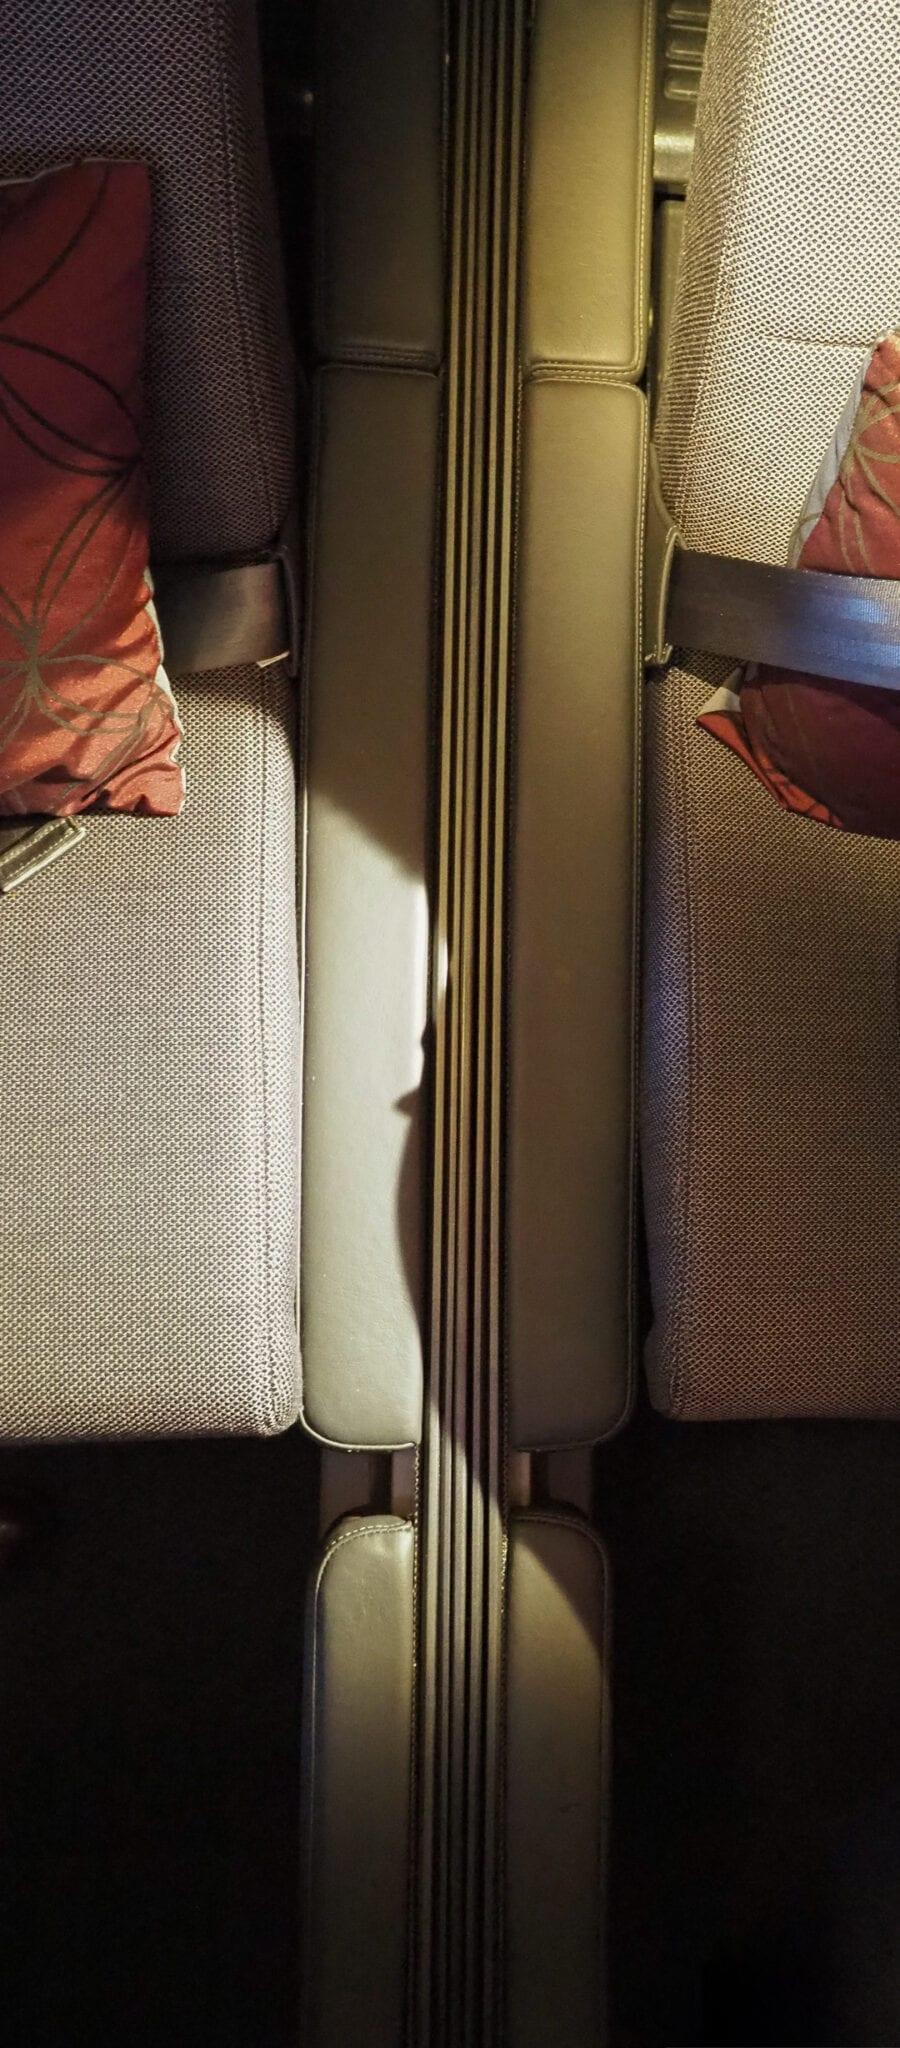 Q suites QR LHR DOH 24 scaled - REVIEW - Qatar Airways : Q Suites Business Class - B777 - London (LHR) to Doha (DOH)